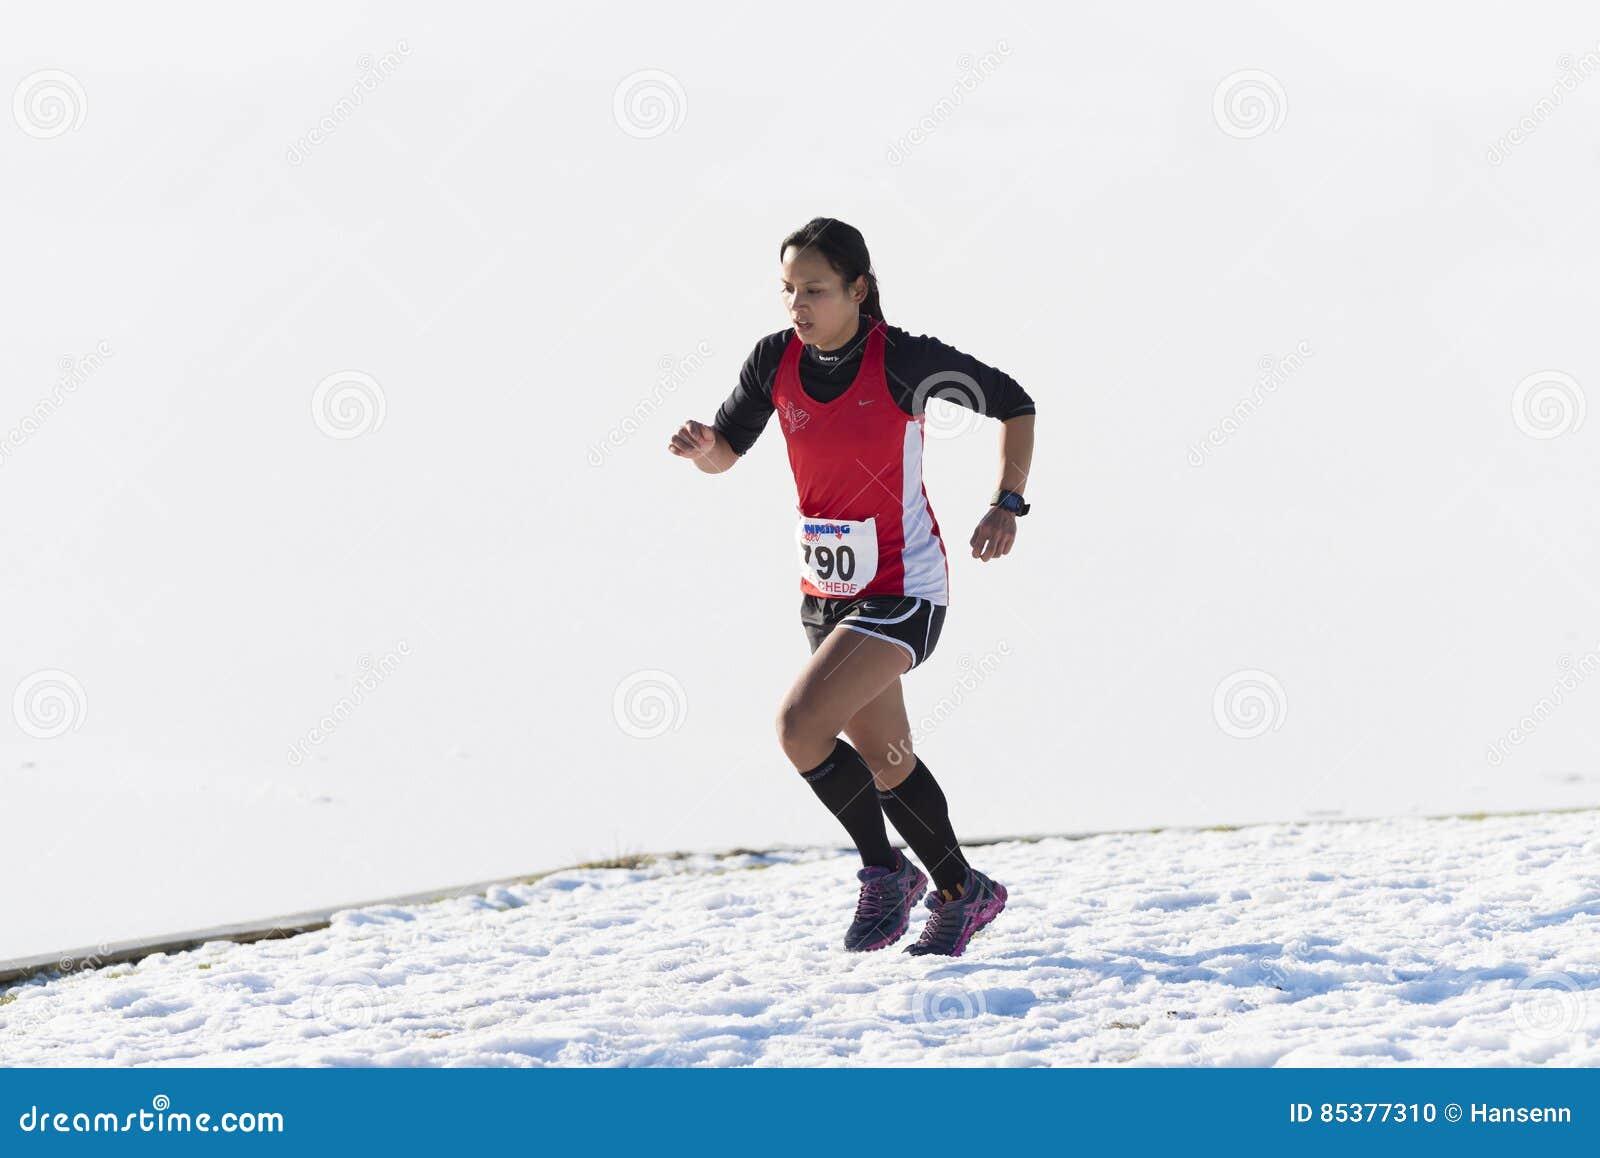 Liabilities in long distance endurance sports essay